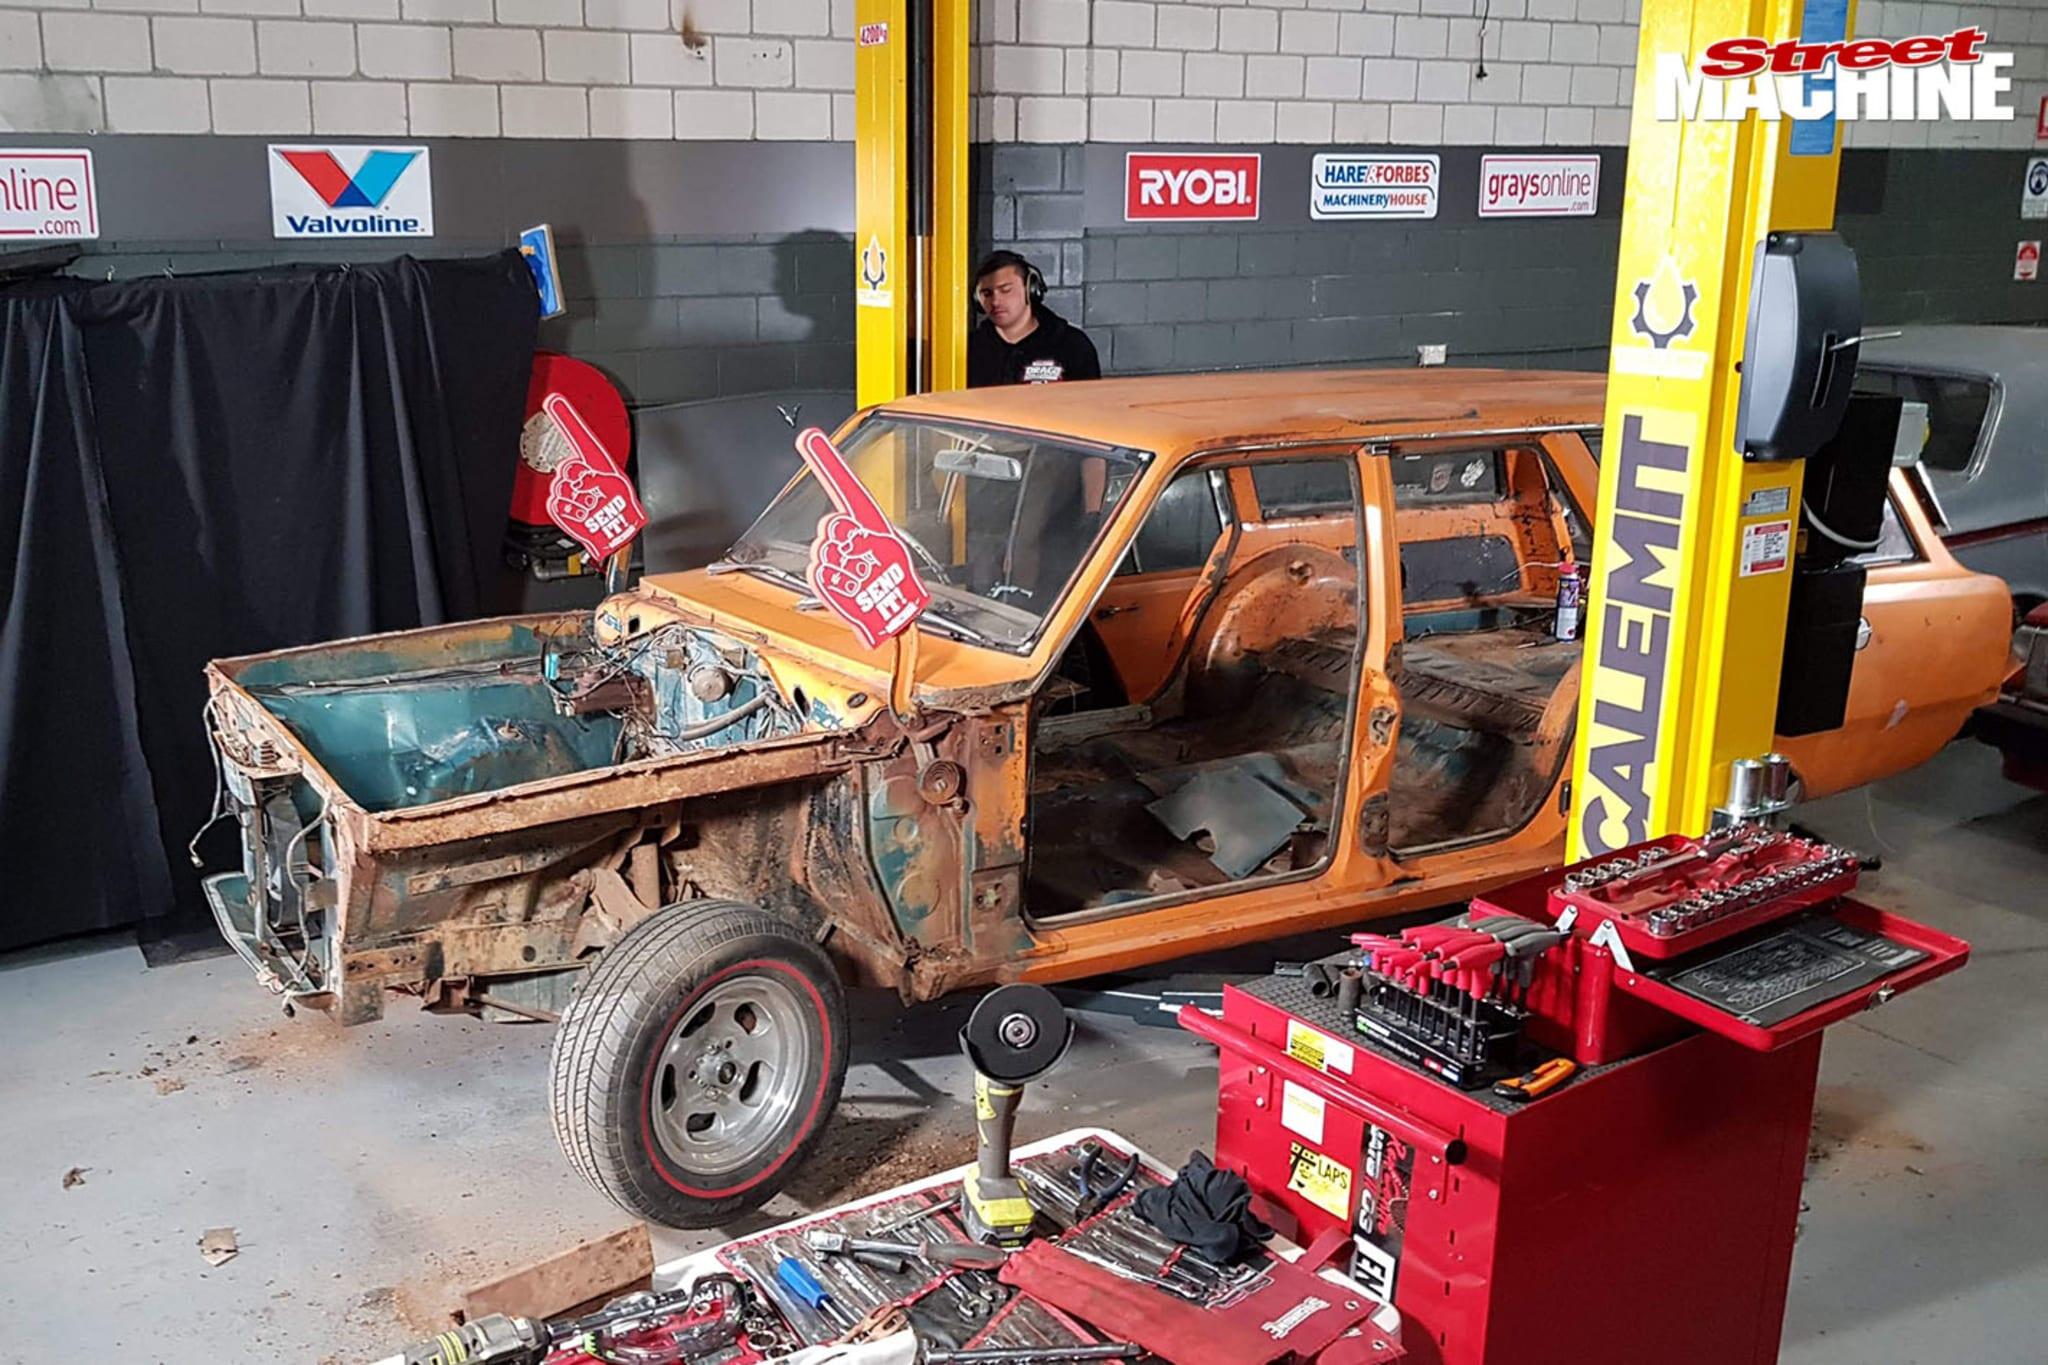 Street Machine TV Valiant Wagon